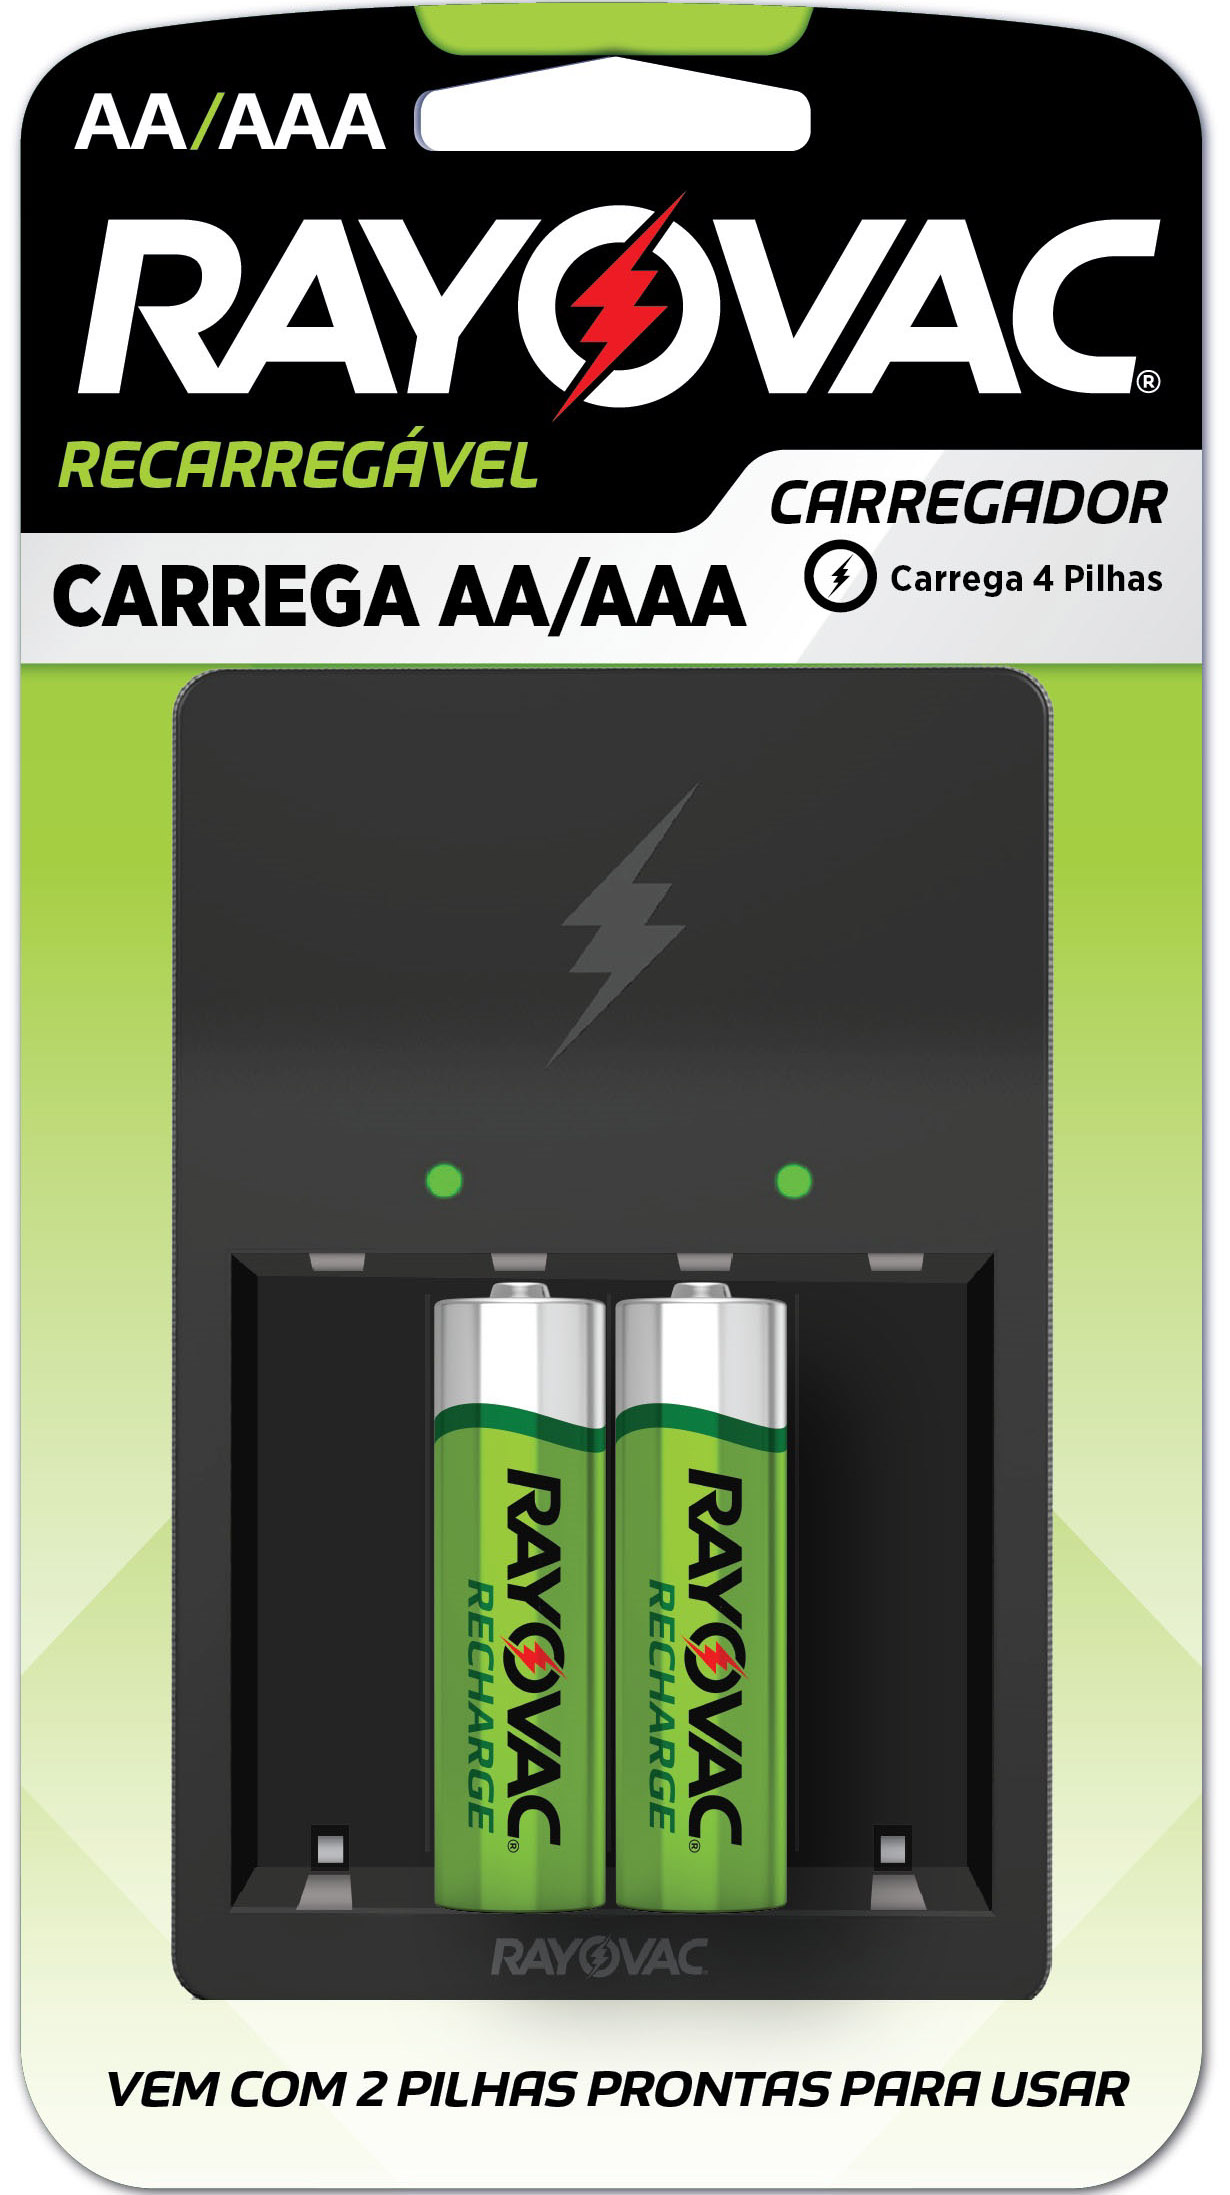 CARREGADOR RAY RECAREGAVEL AA/AAA 1UN(4)